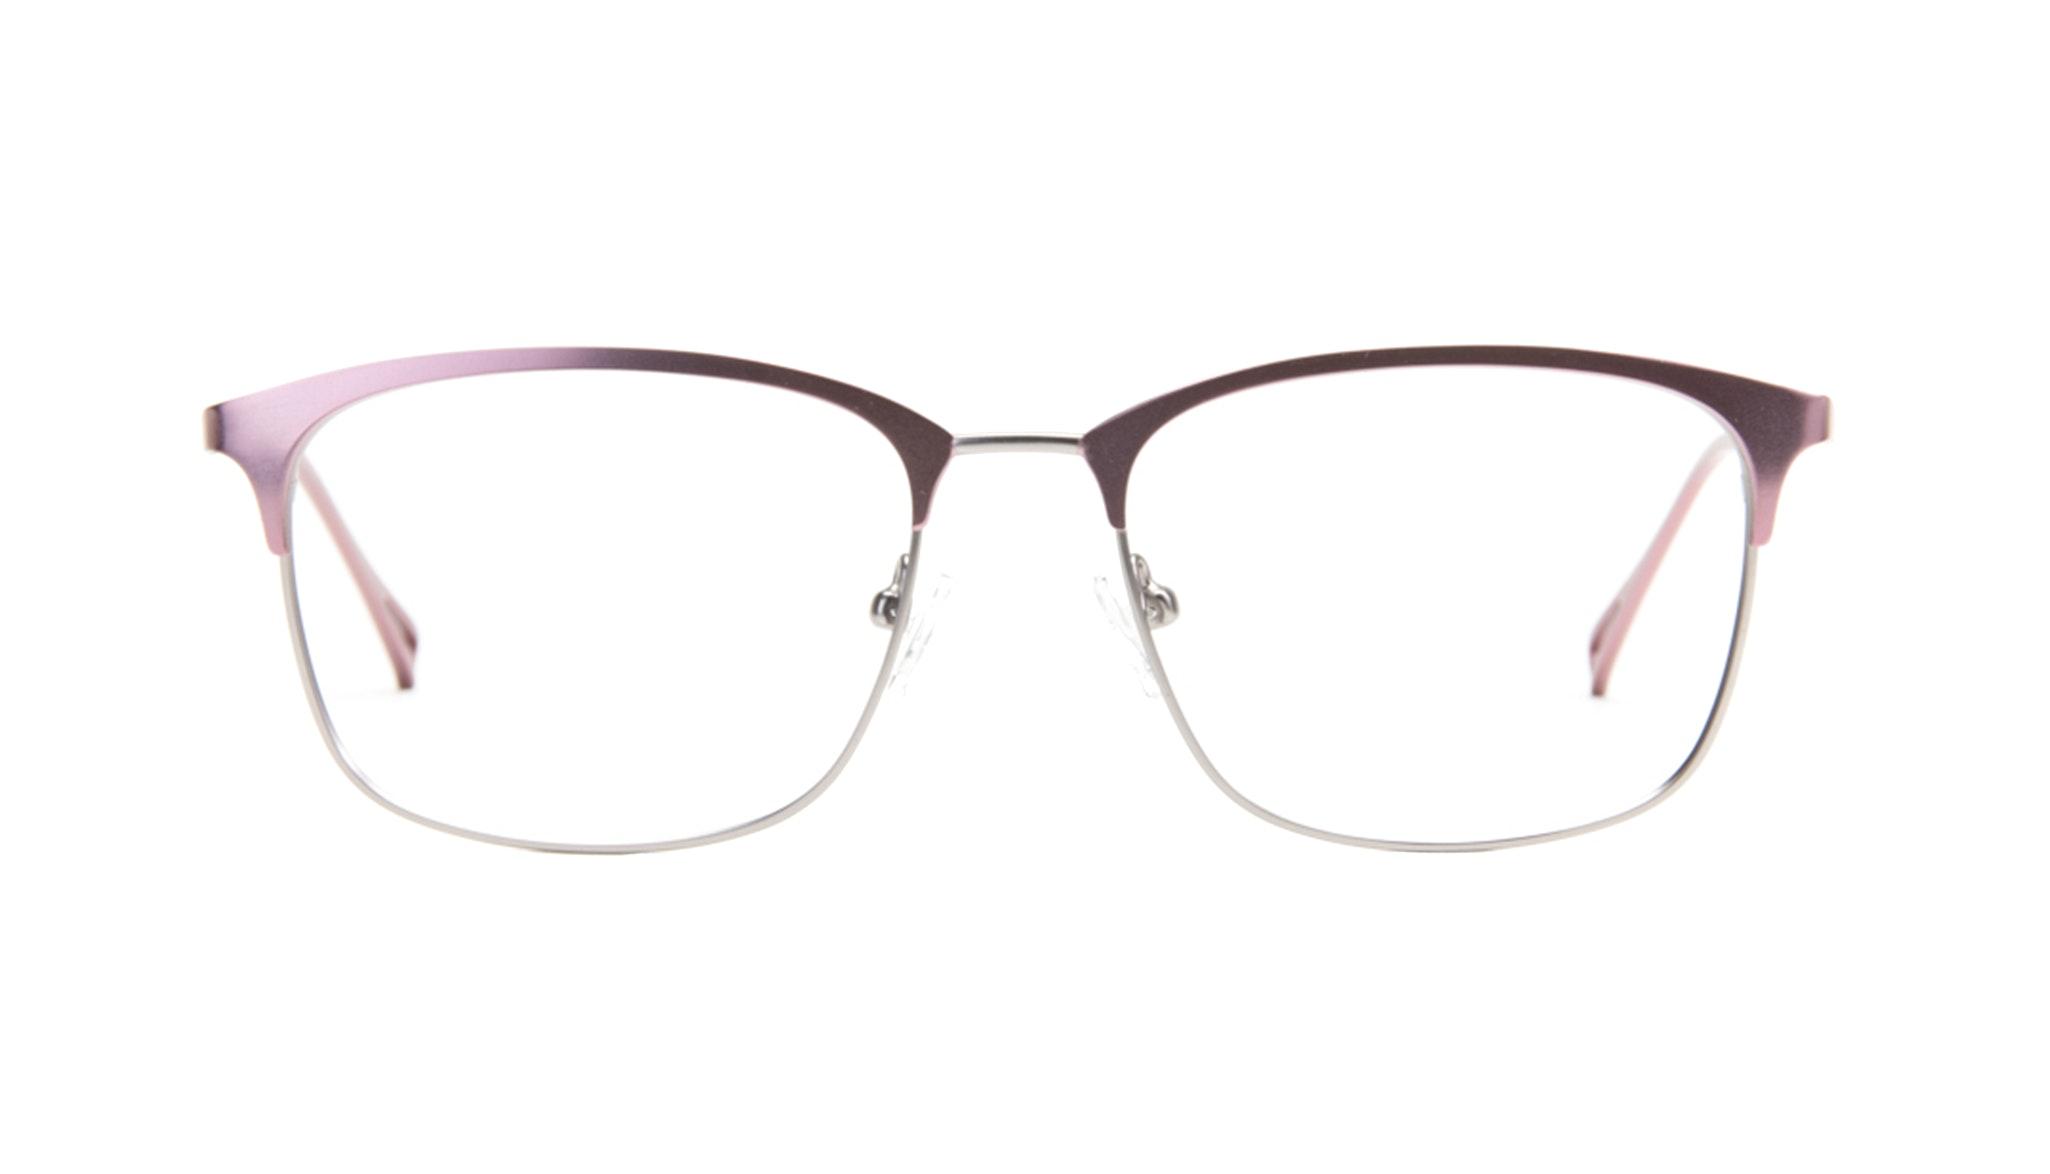 fashion eyeglasses  women\u0027s Fashion Eyeglasses: Affordable Eyewear For women